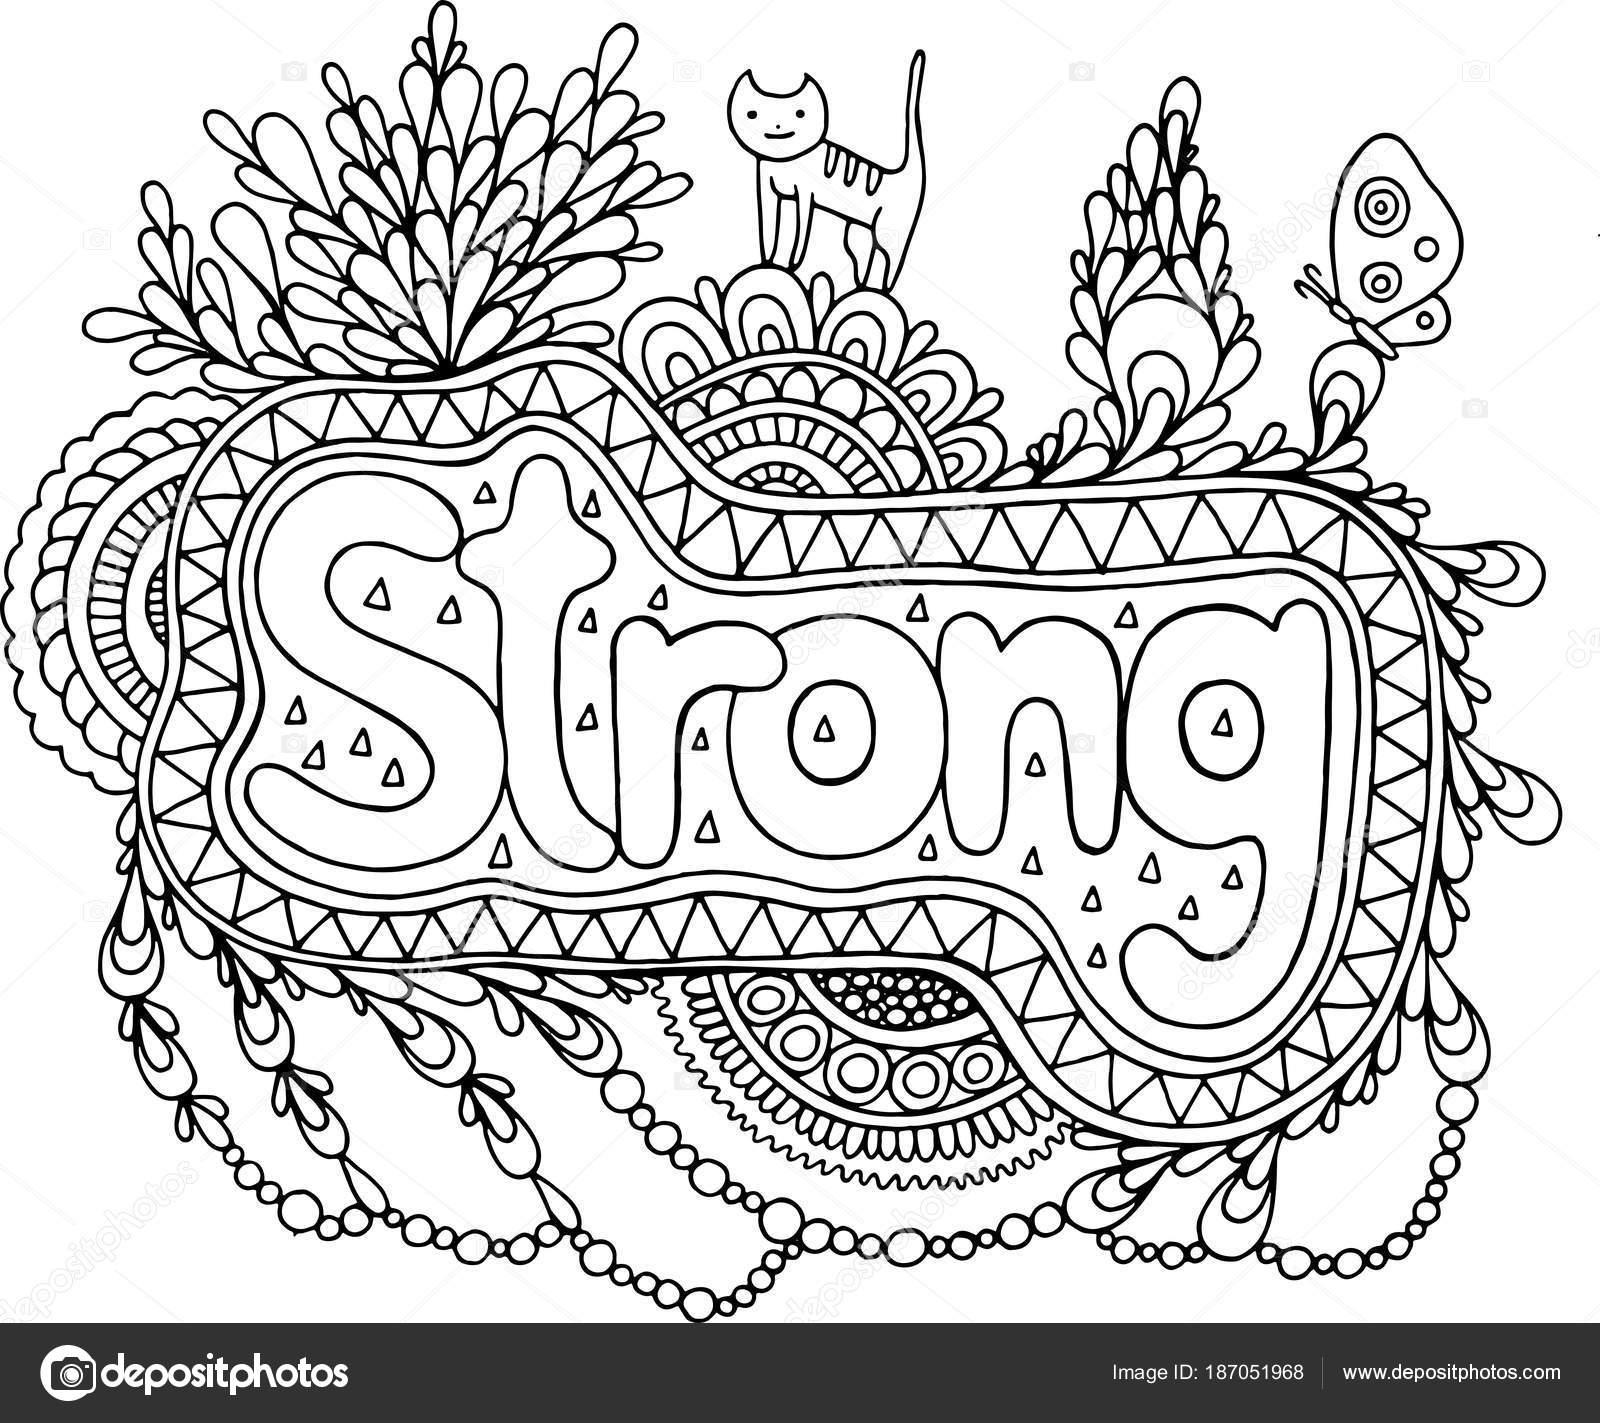 kleurplaat voor volwassenen met mandala en sterk woord